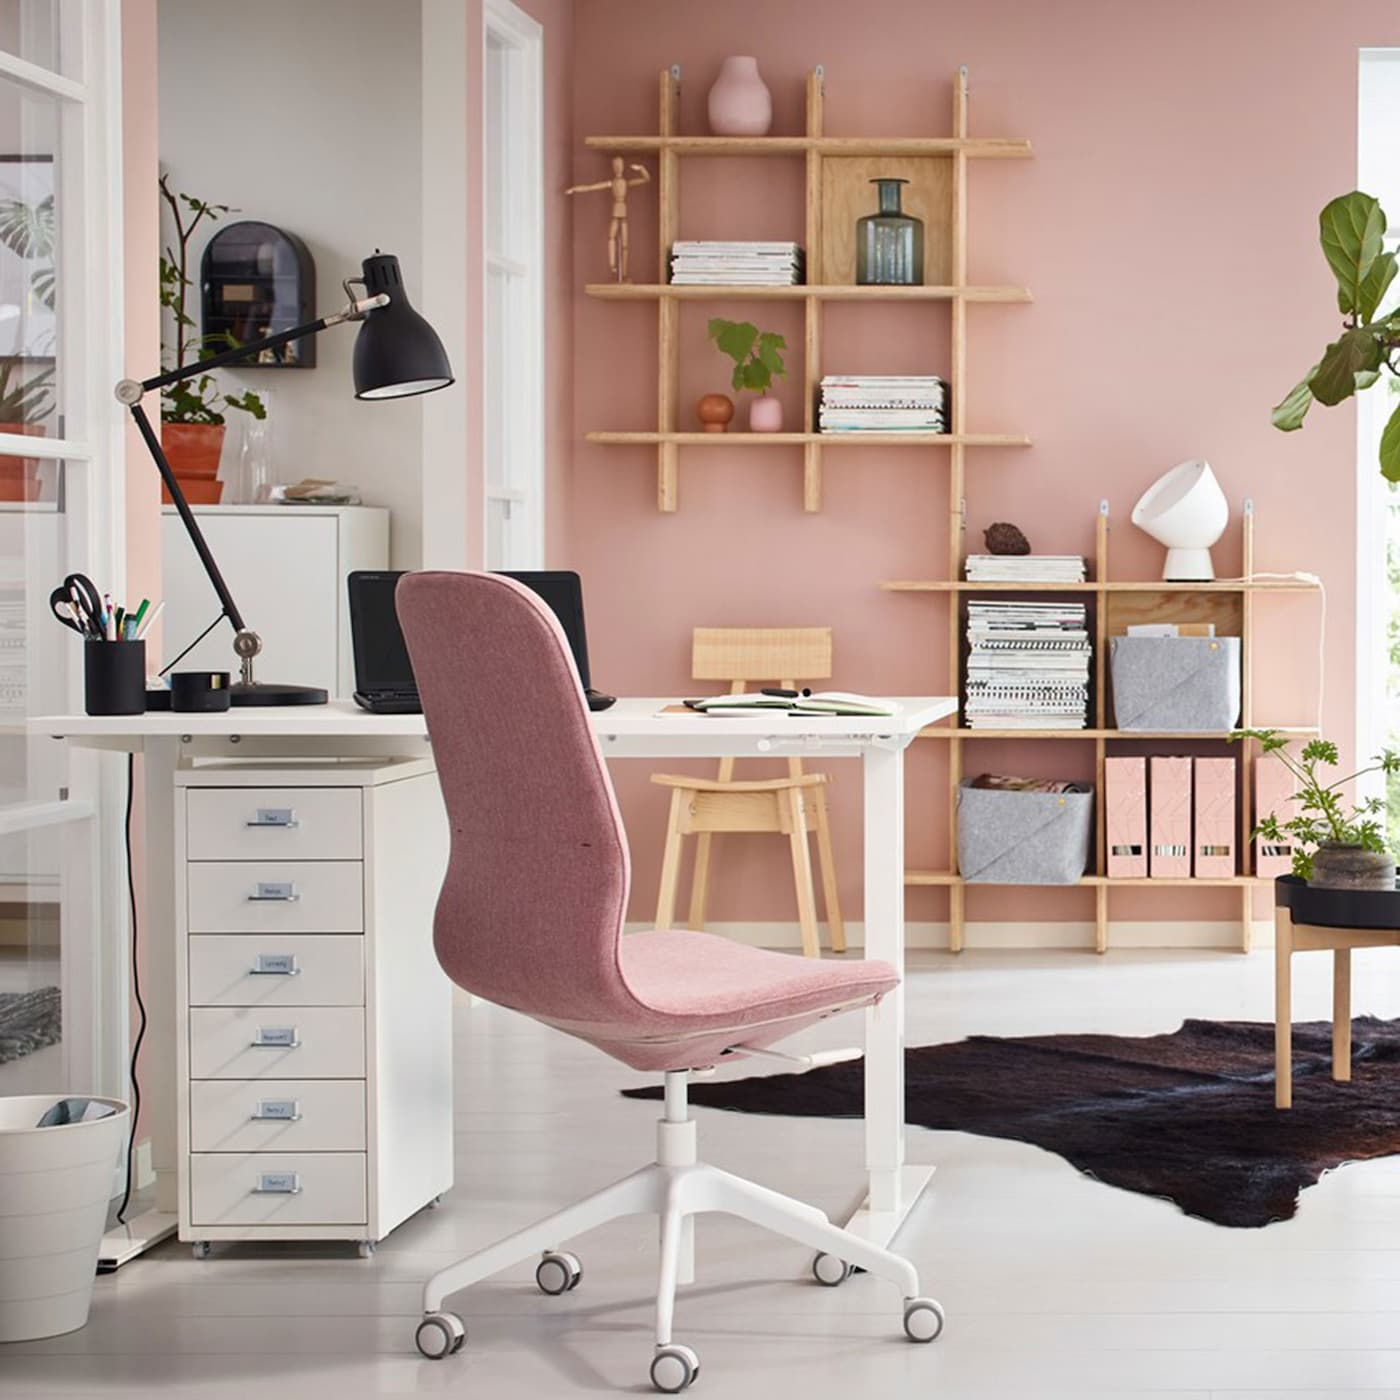 Mensole Ikea Cucina Prezzi furnishing ideas & inspiration for your home office - ikea